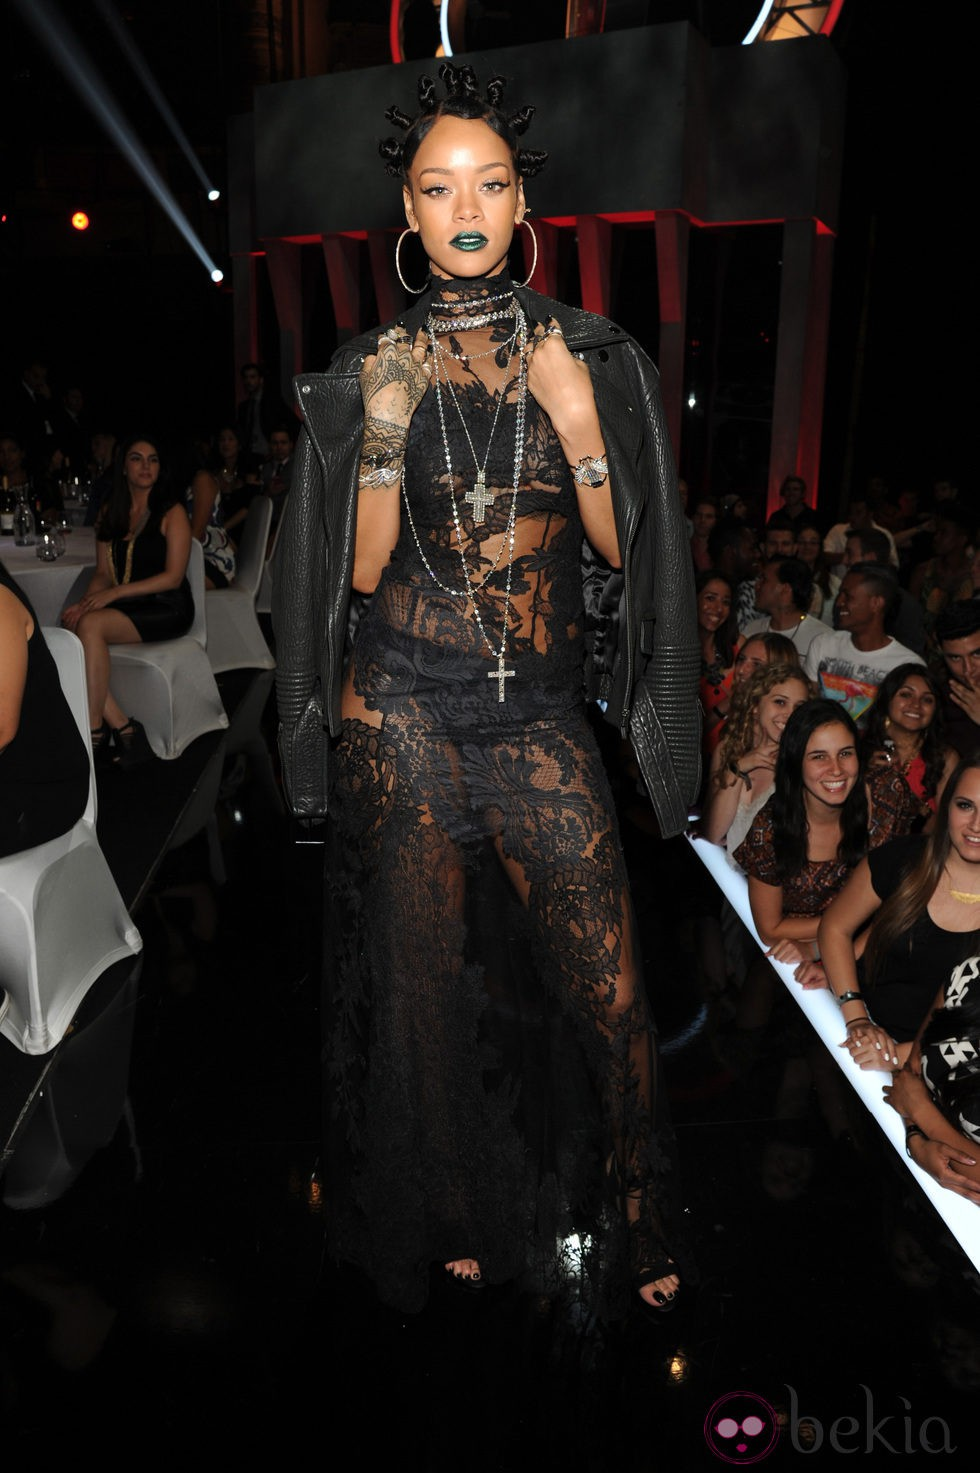 Rihanna en los iHeartRadio Music Awards 2014